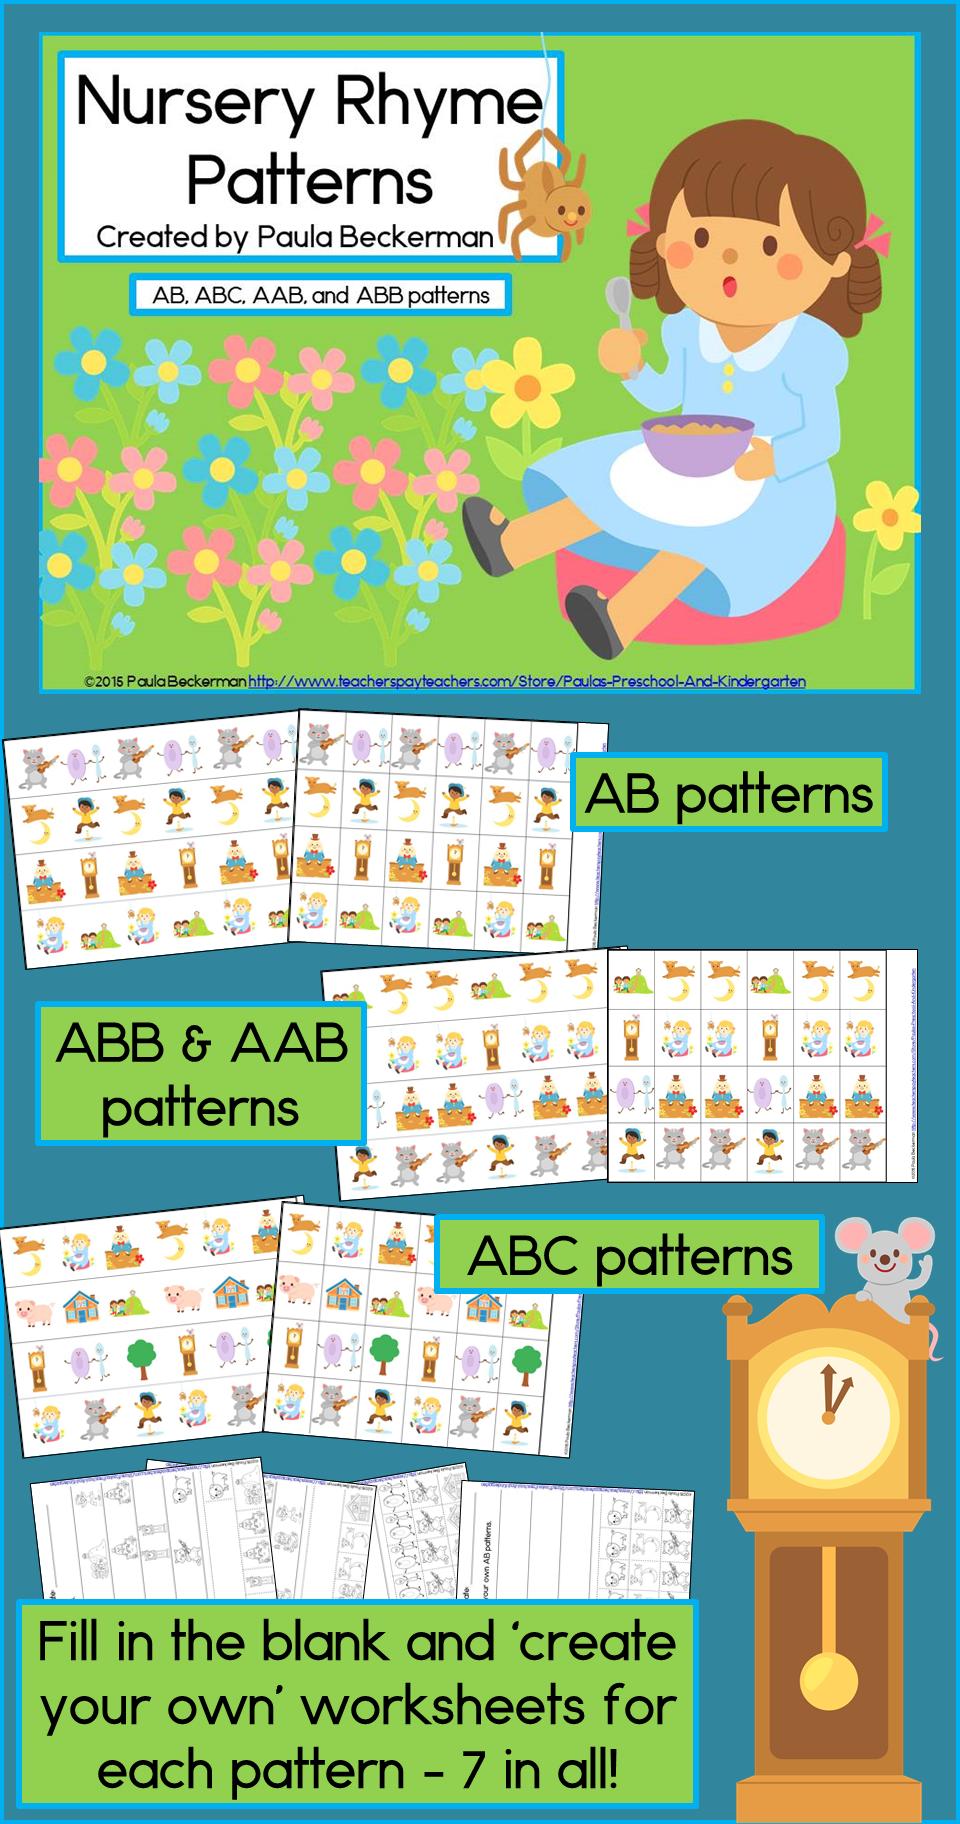 Workbooks rhyming patterns worksheets : Nursery Rhyme Patterns Math Center with AB, ABC, AAB & ABB ...